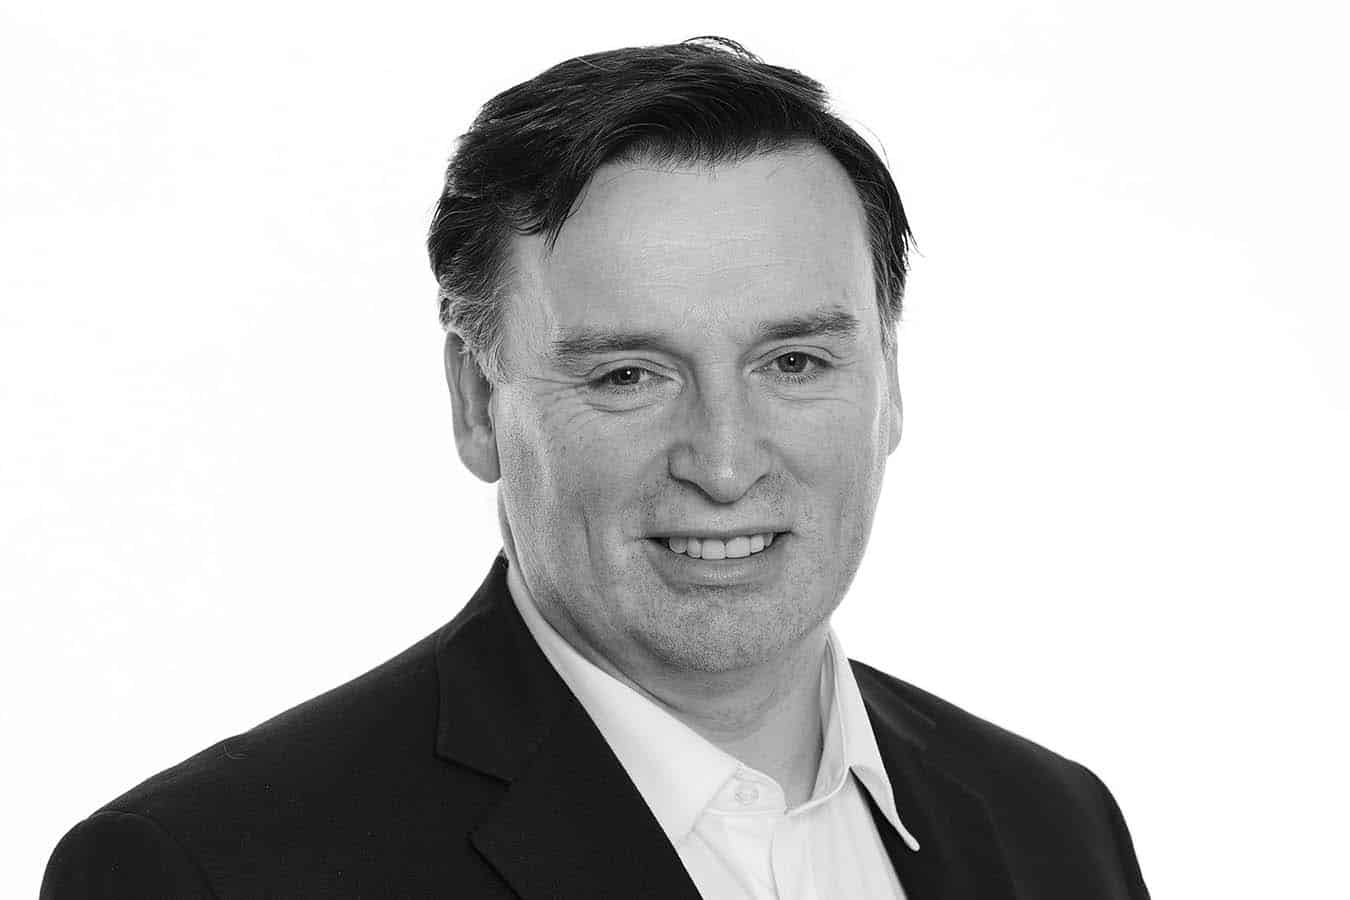 Business & Finance, CIO 100 acknowledges Sysnet's Patrick Condren, Chief Information Officer